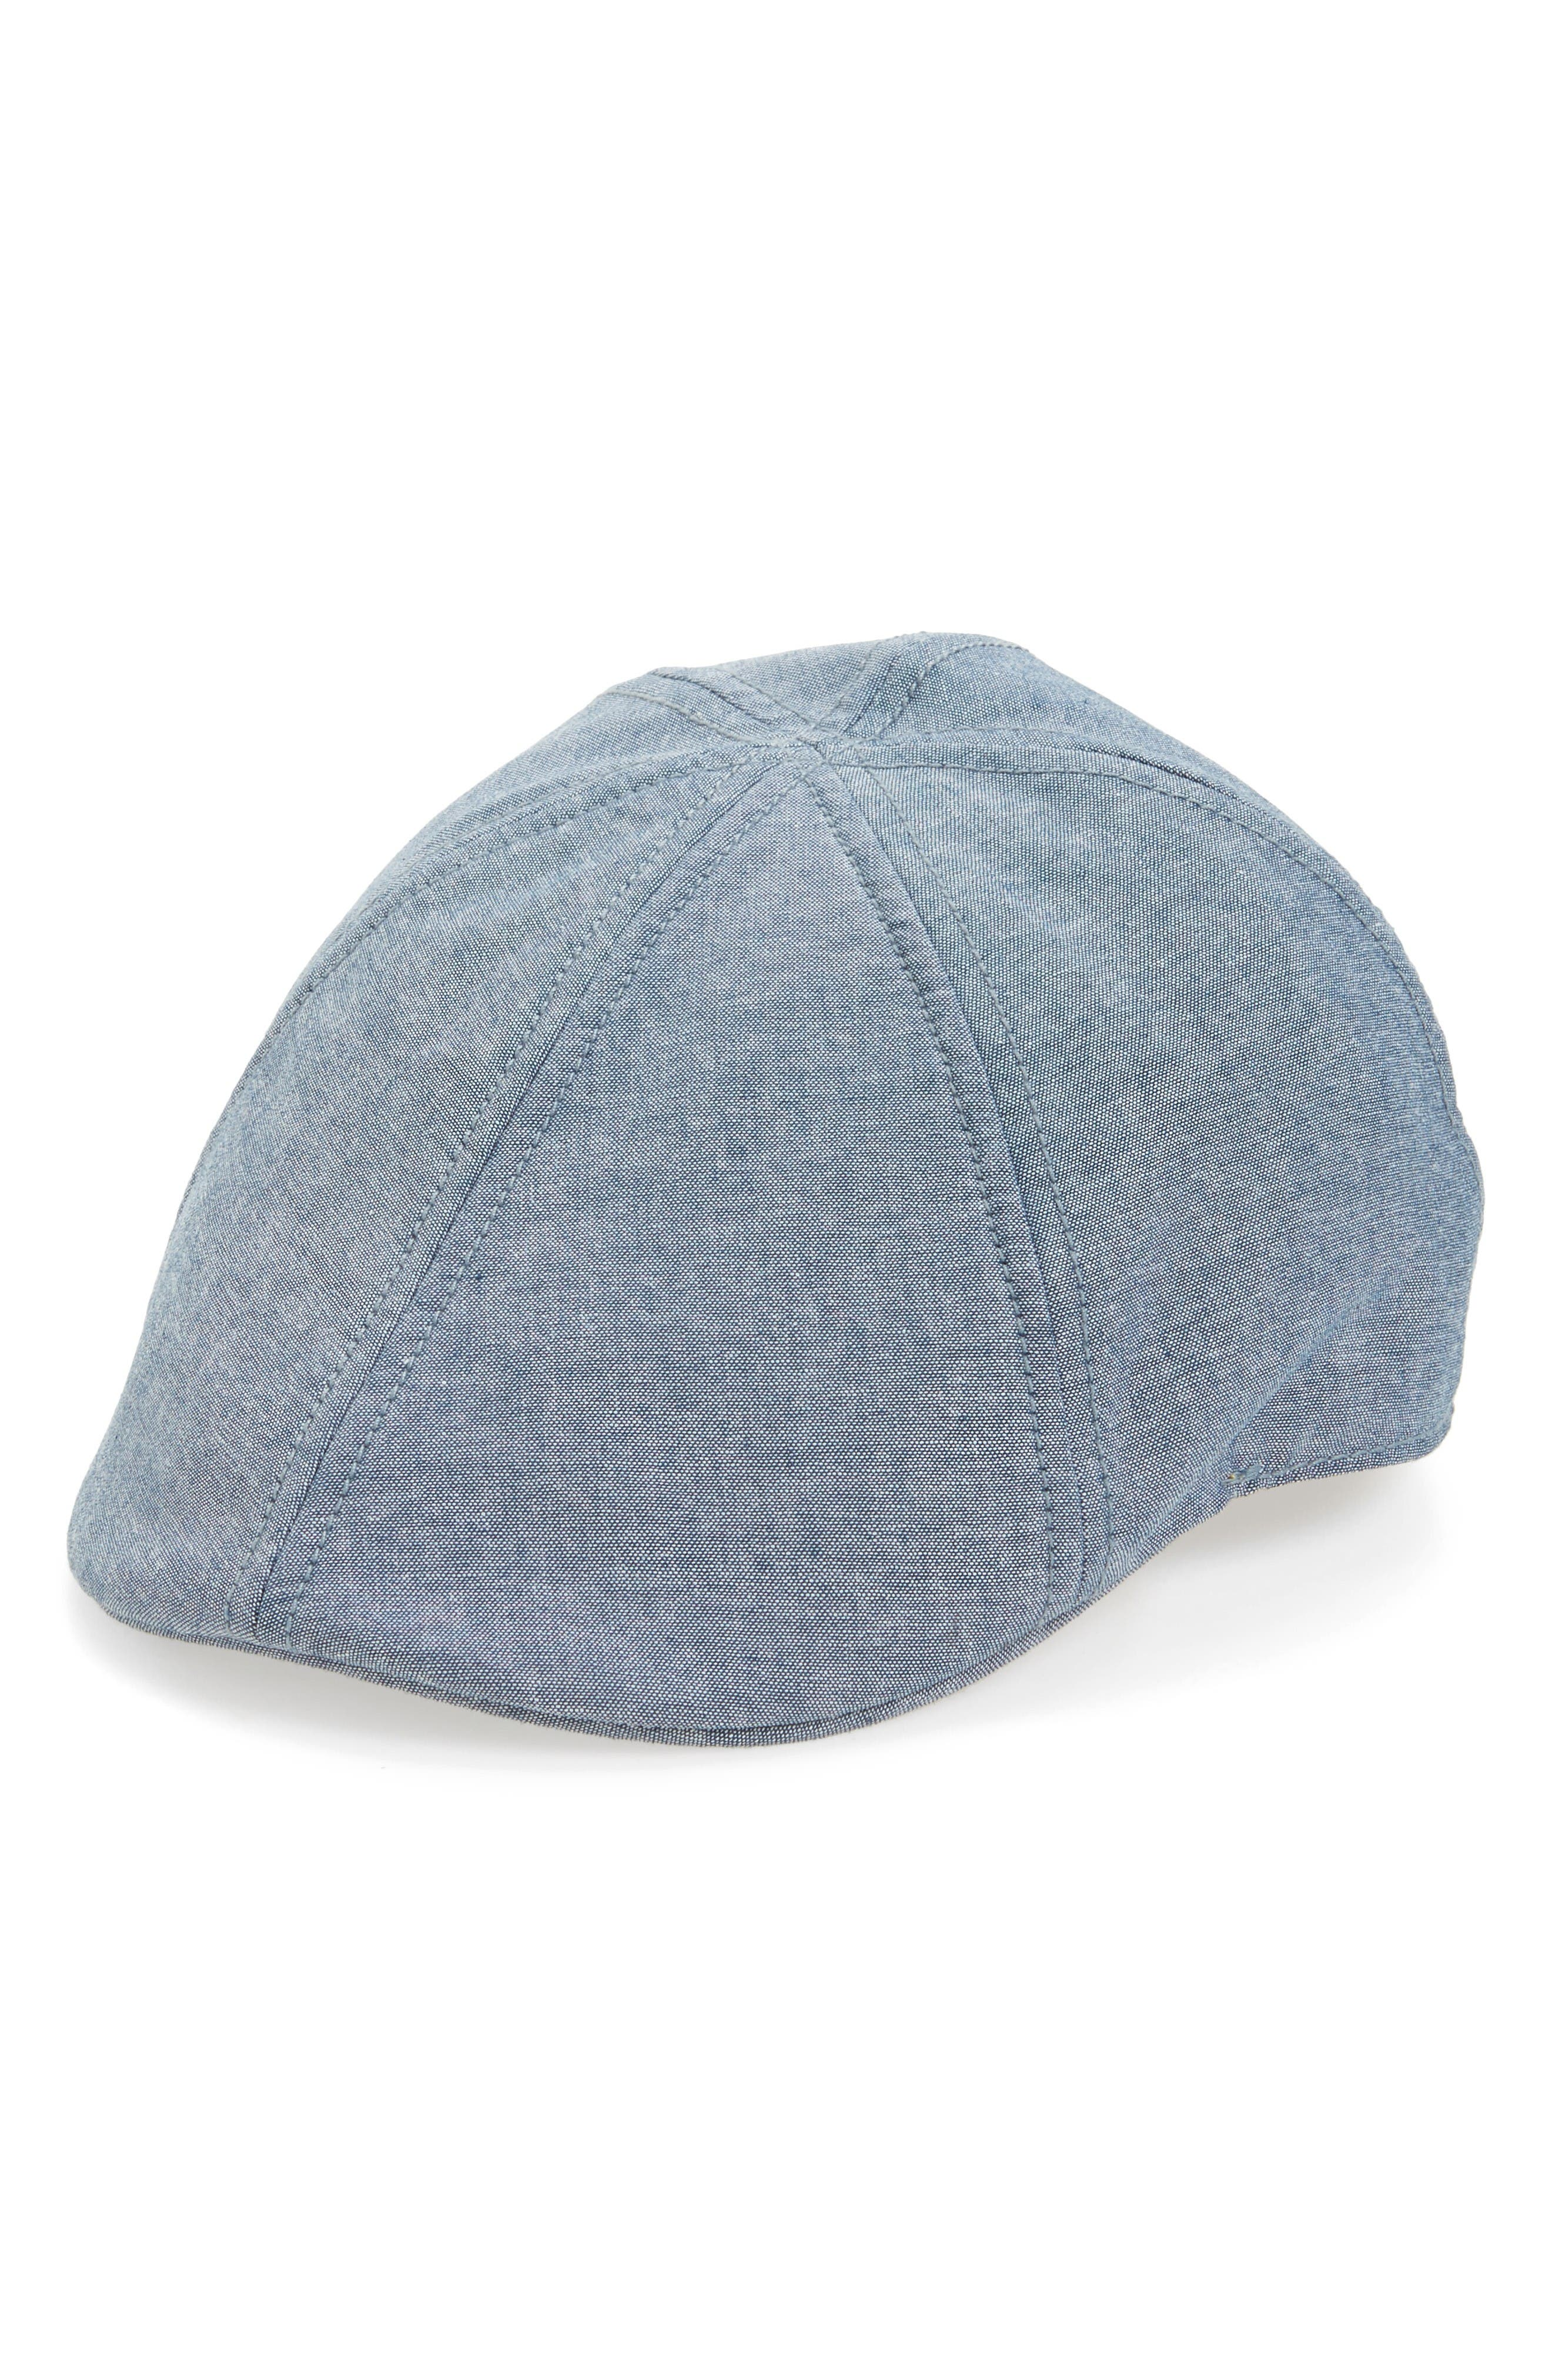 Mr. Bang Driver's Hat,                         Main,                         color, Blue